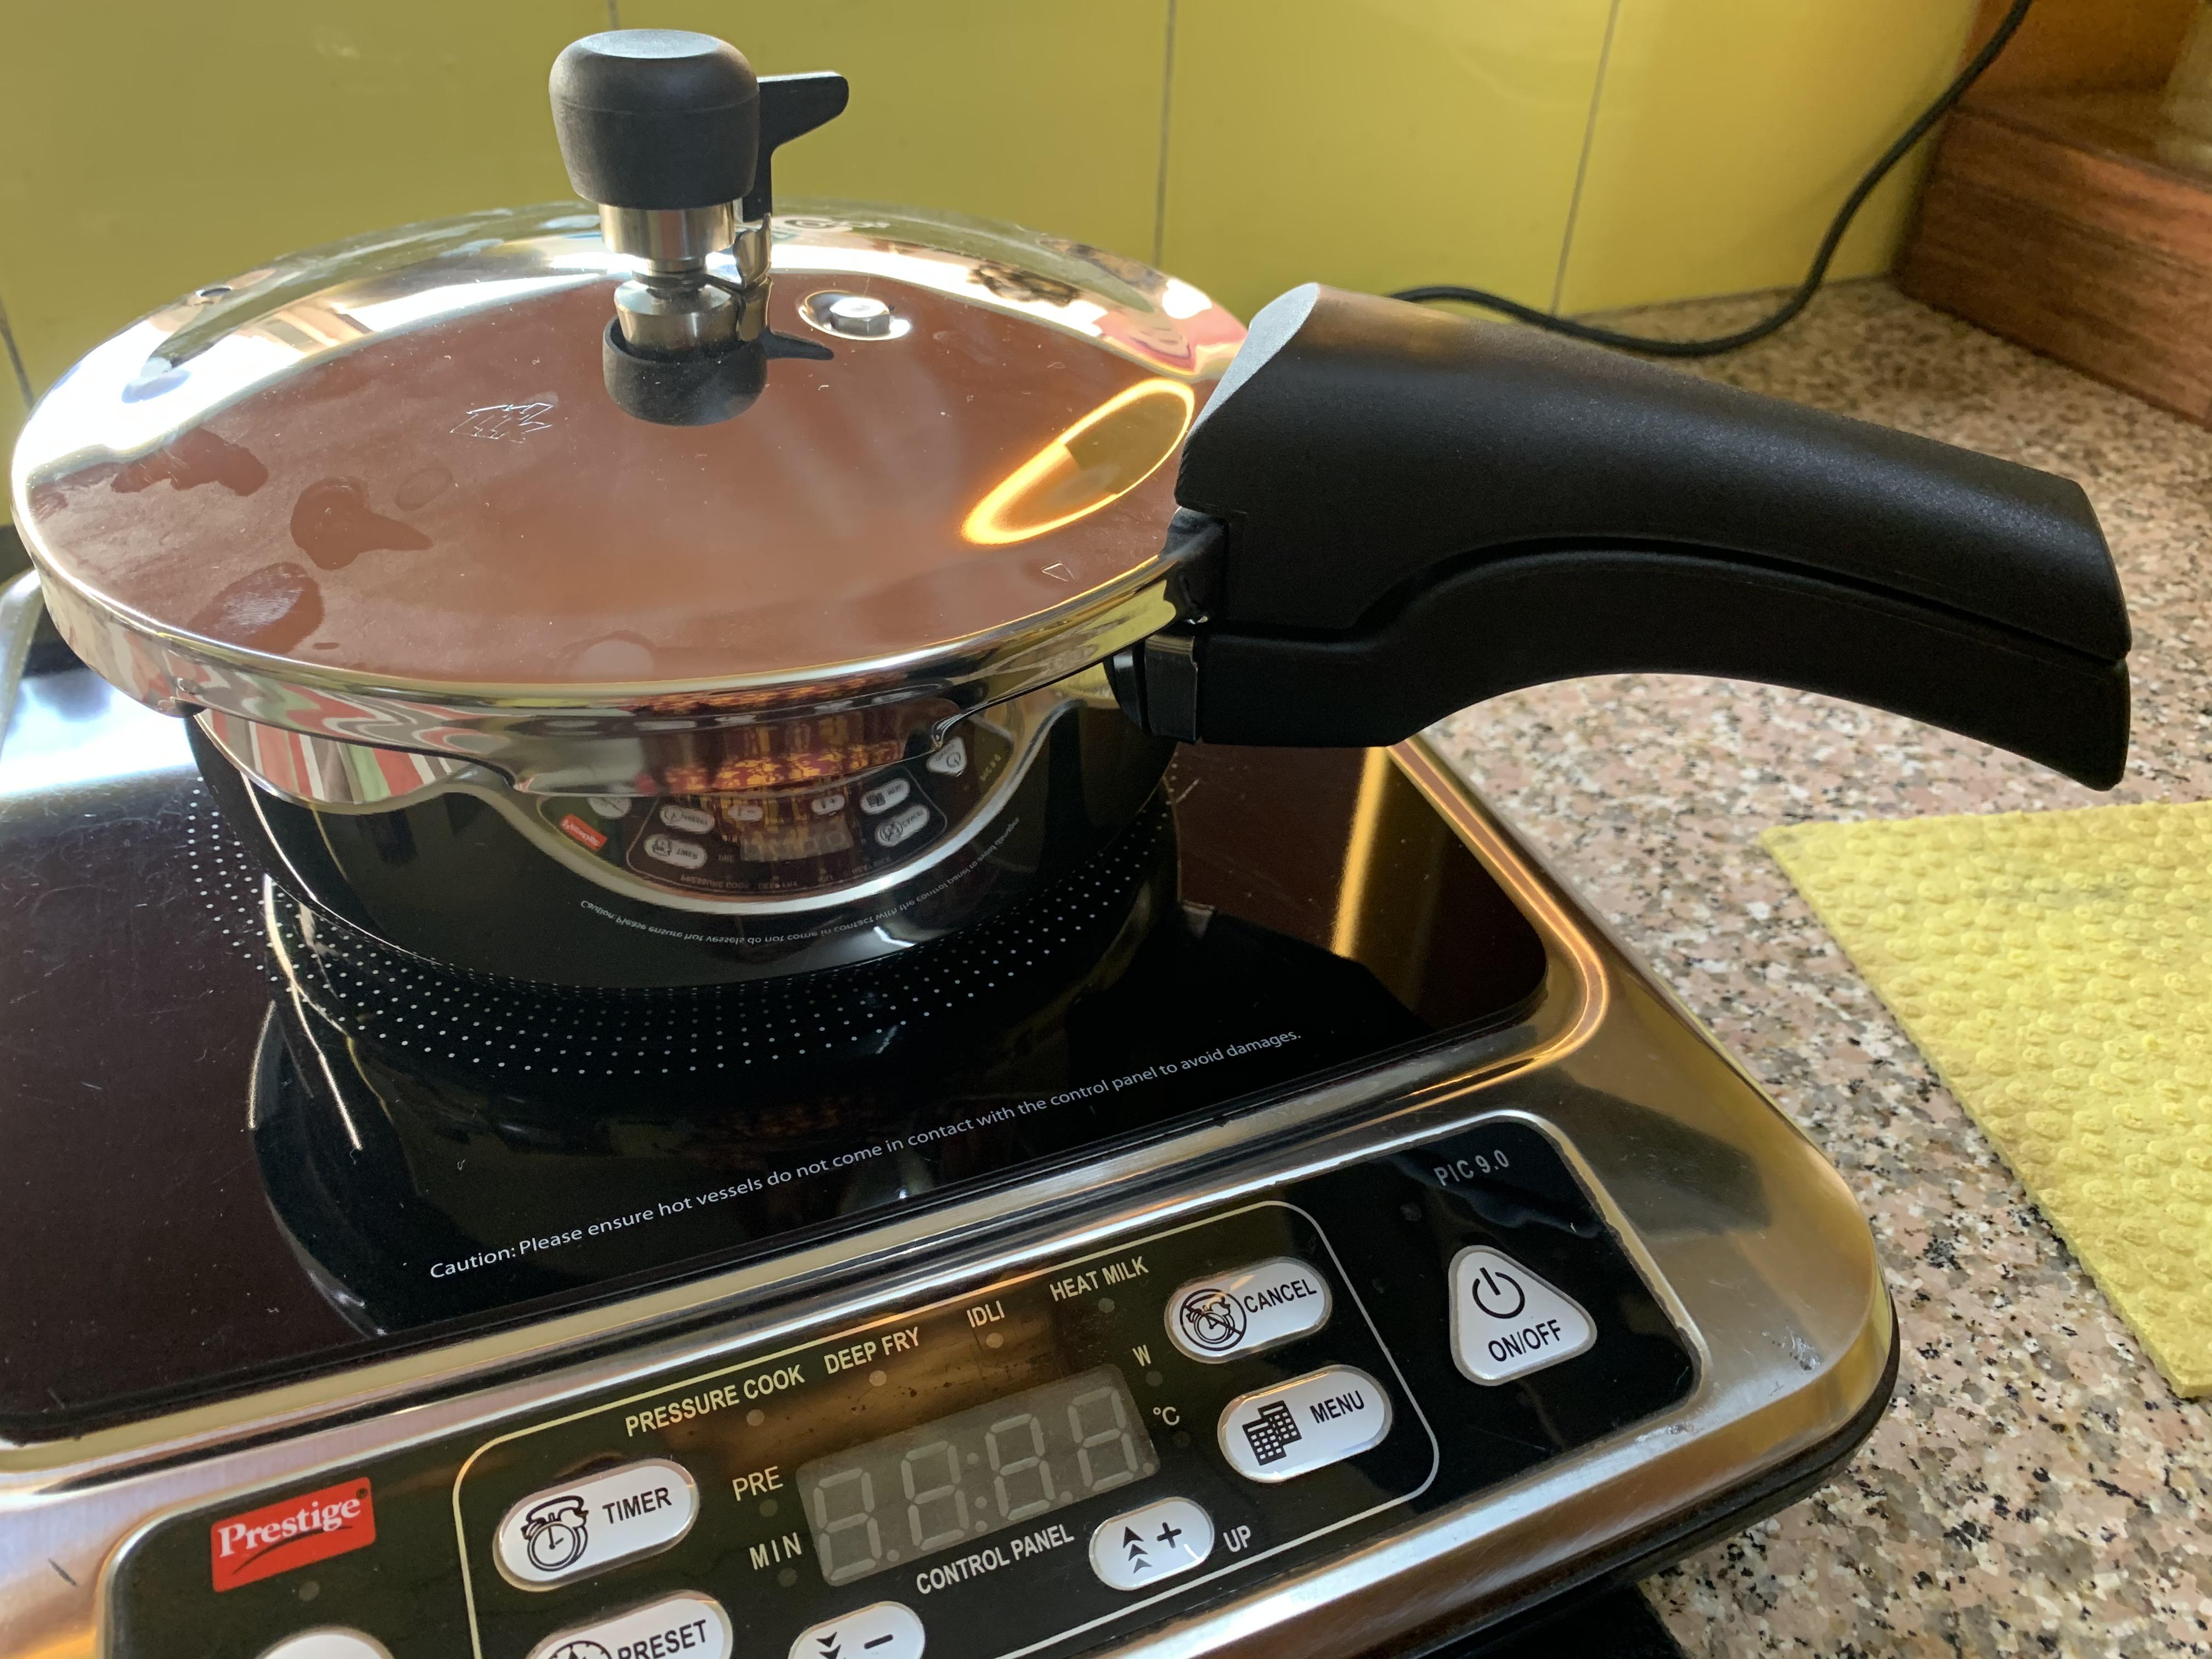 OPOS pressure baker